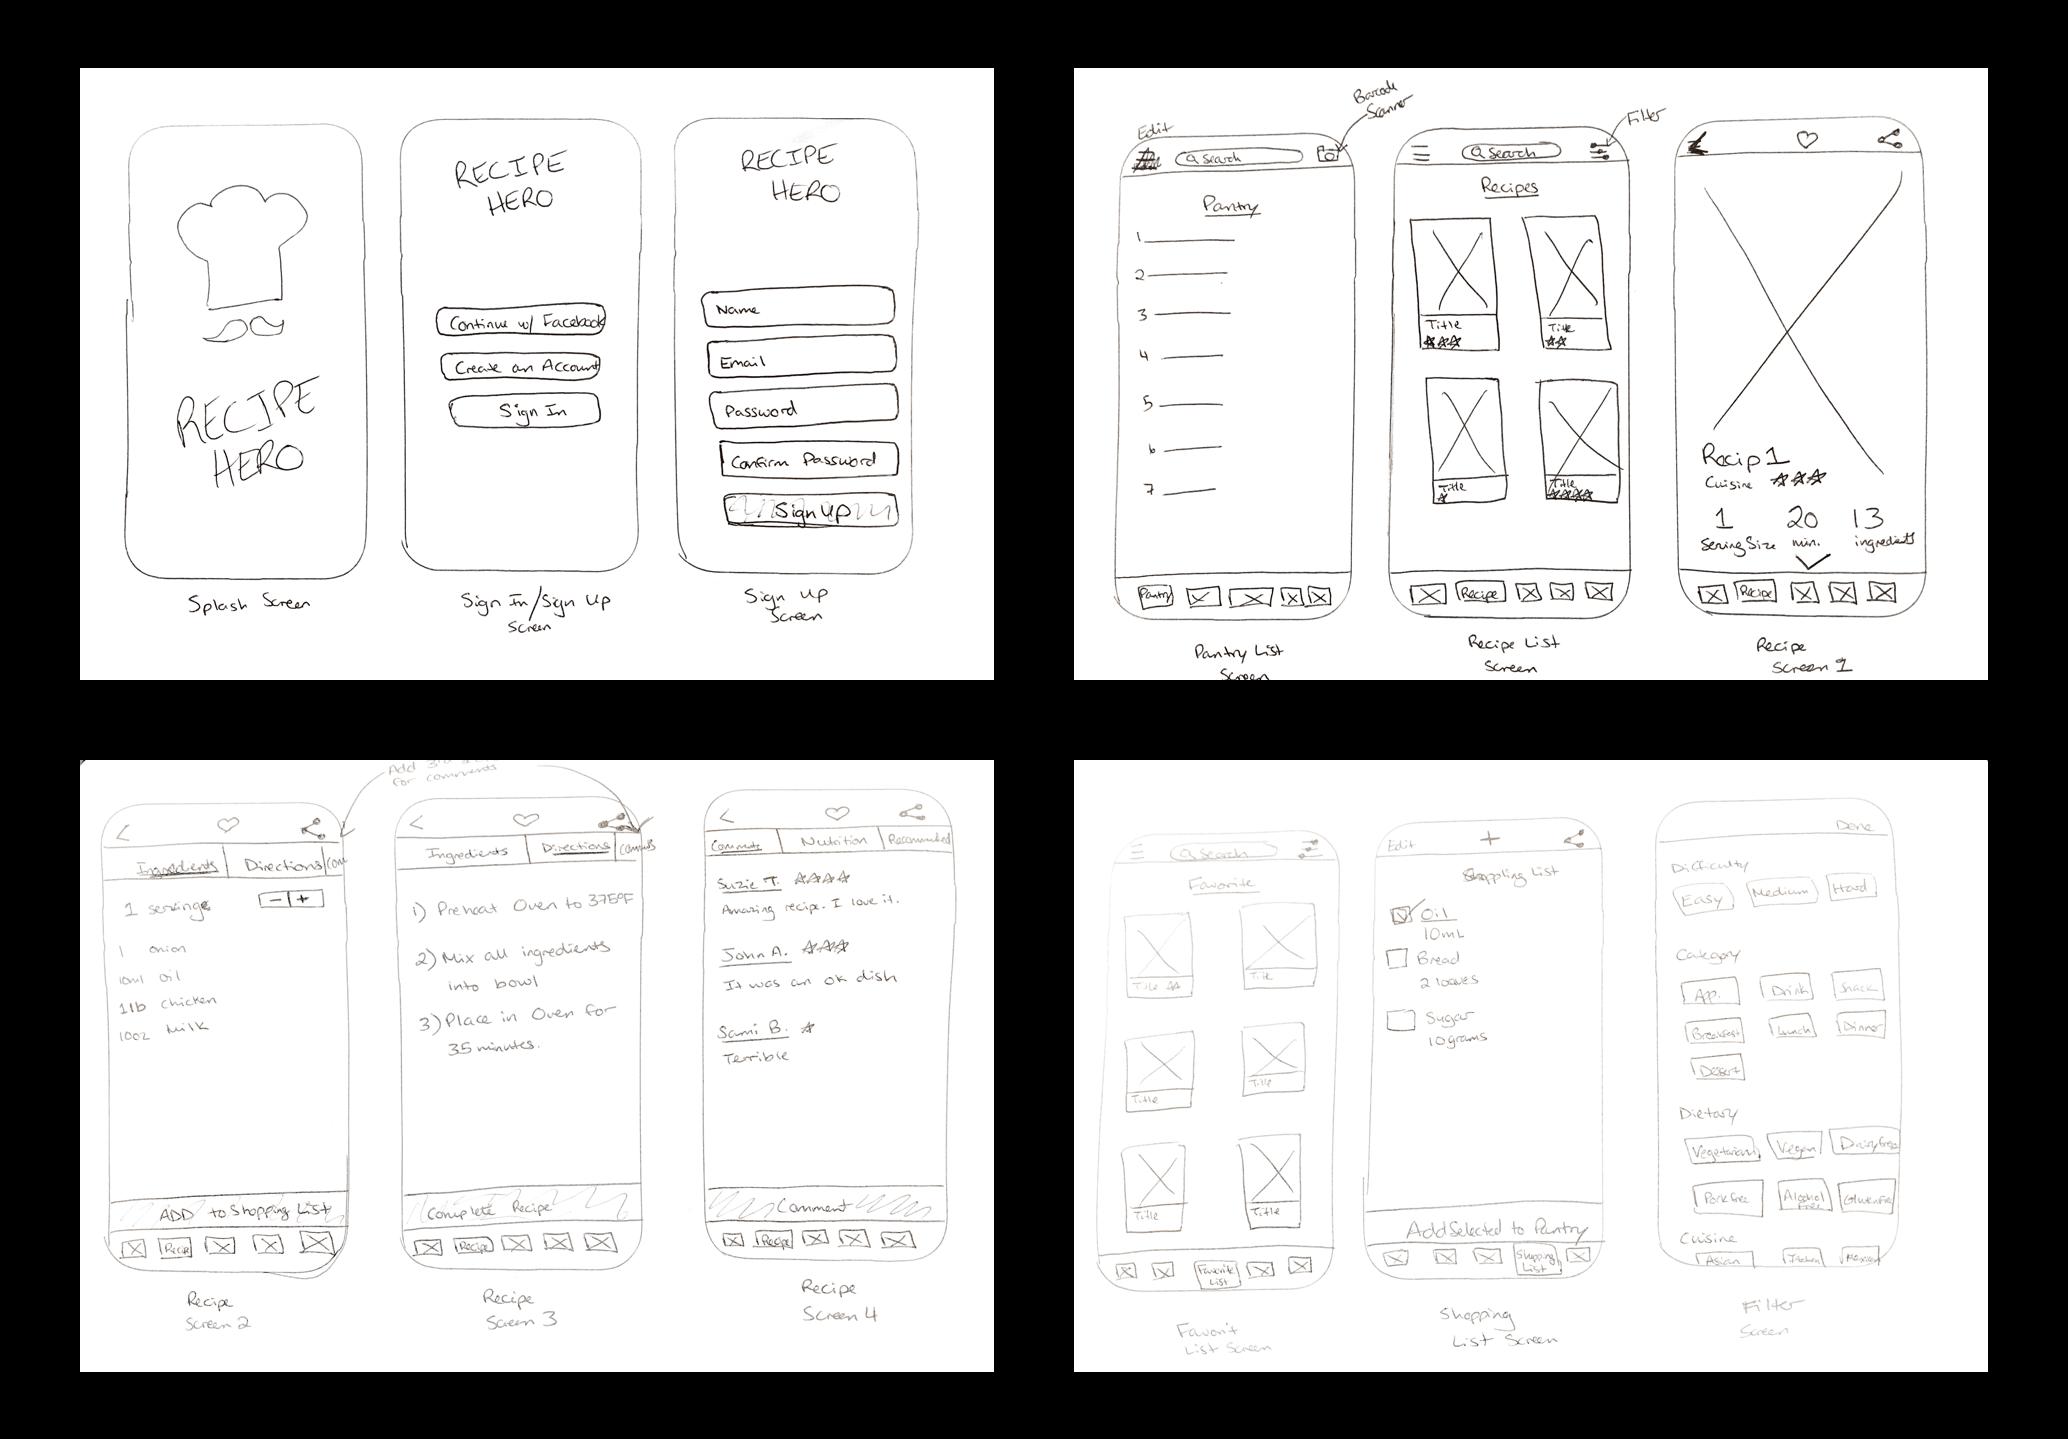 Recipe Hero Sketch 1